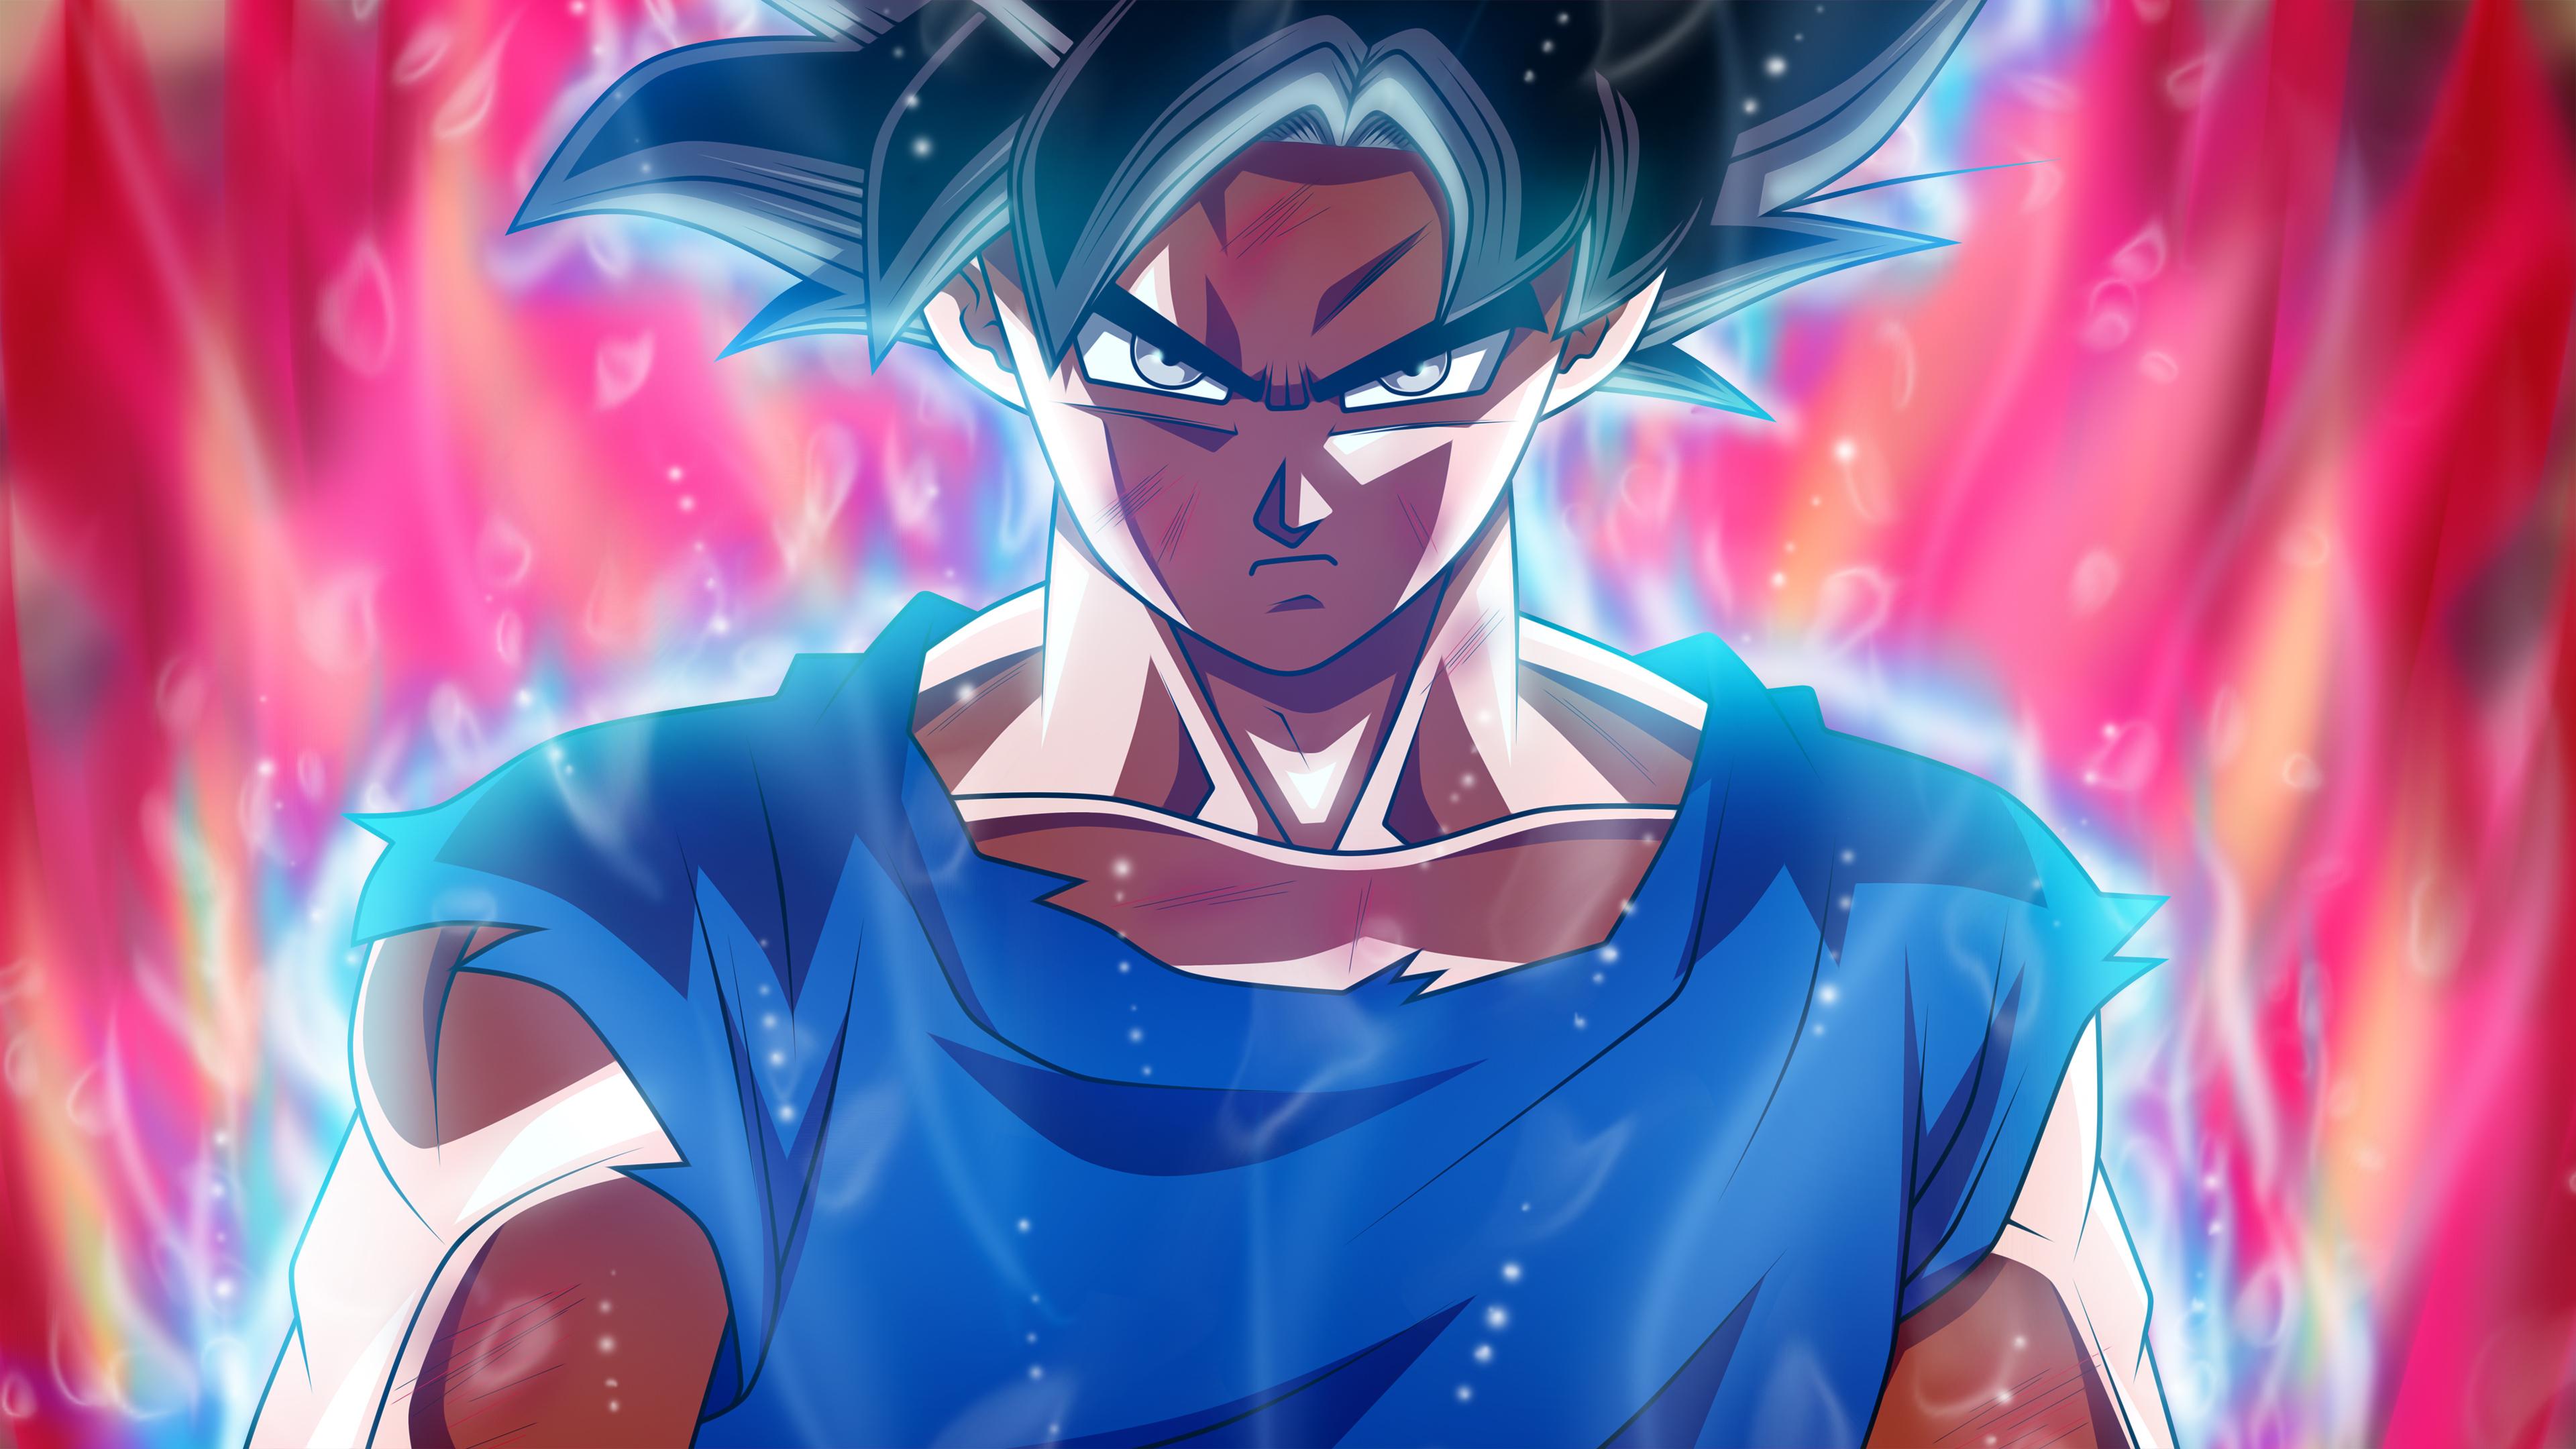 Ultra Instinct Goku 4k Hd Anime 4k Wallpapers Images Backgrounds